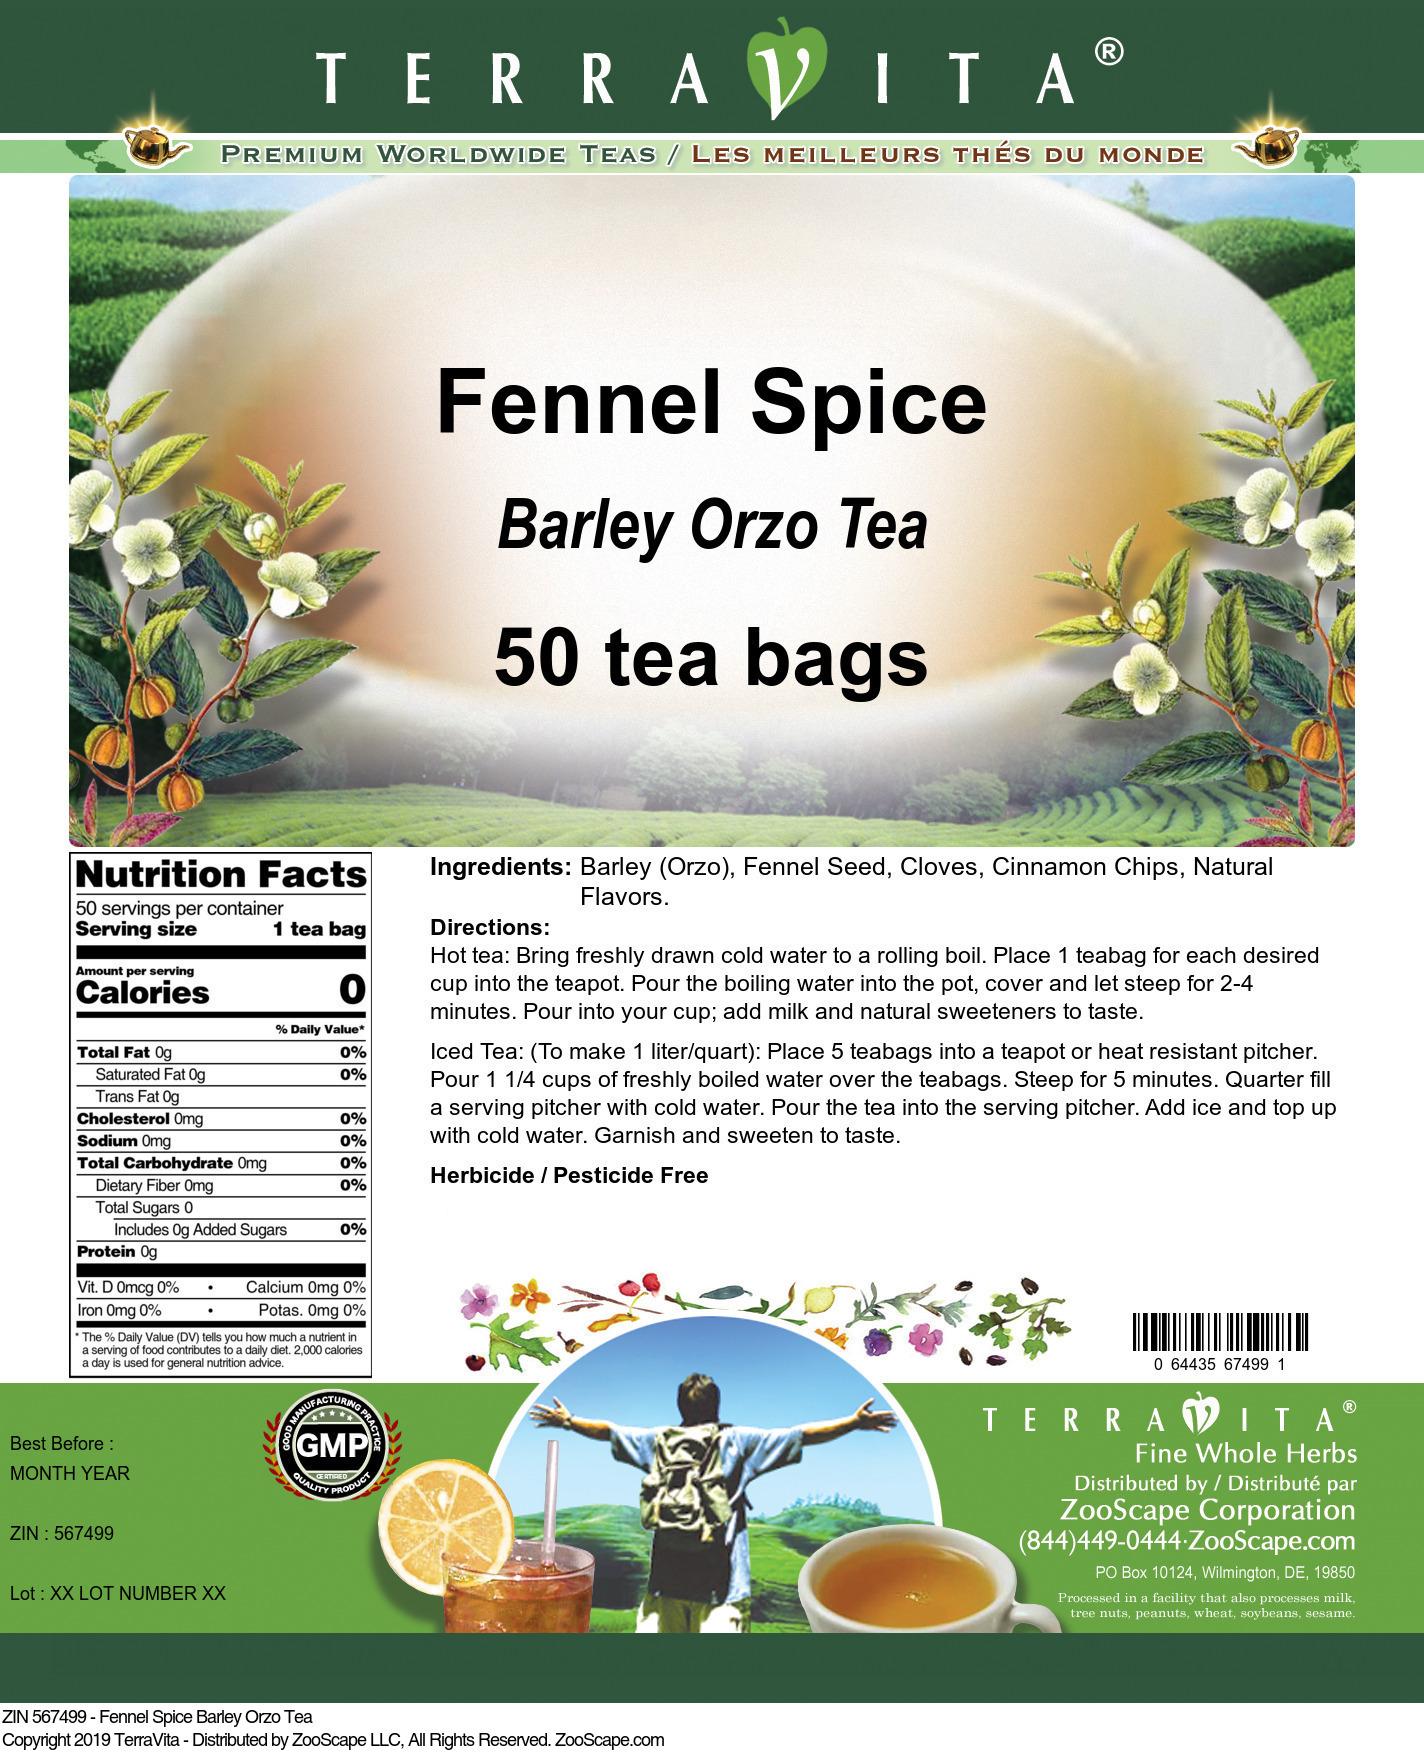 Fennel Spice Barley Orzo Tea